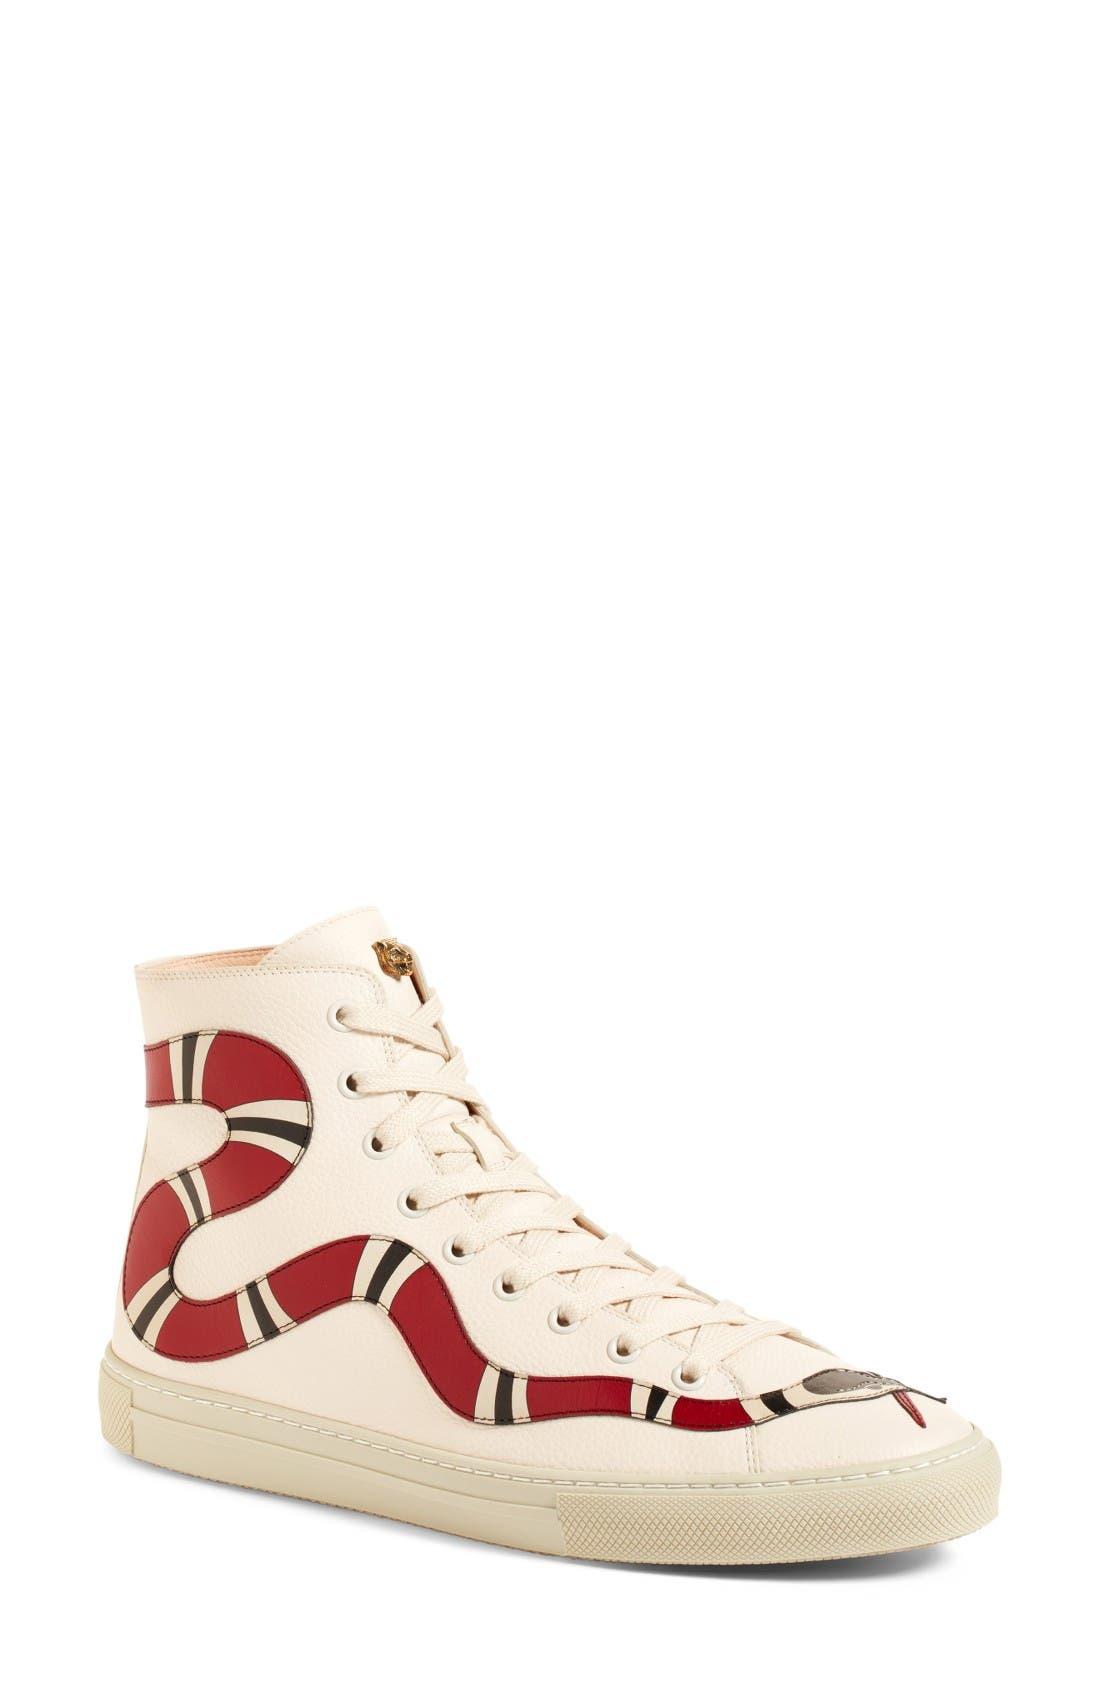 Main Image - Gucci Major Snake High Top Sneaker (Women)